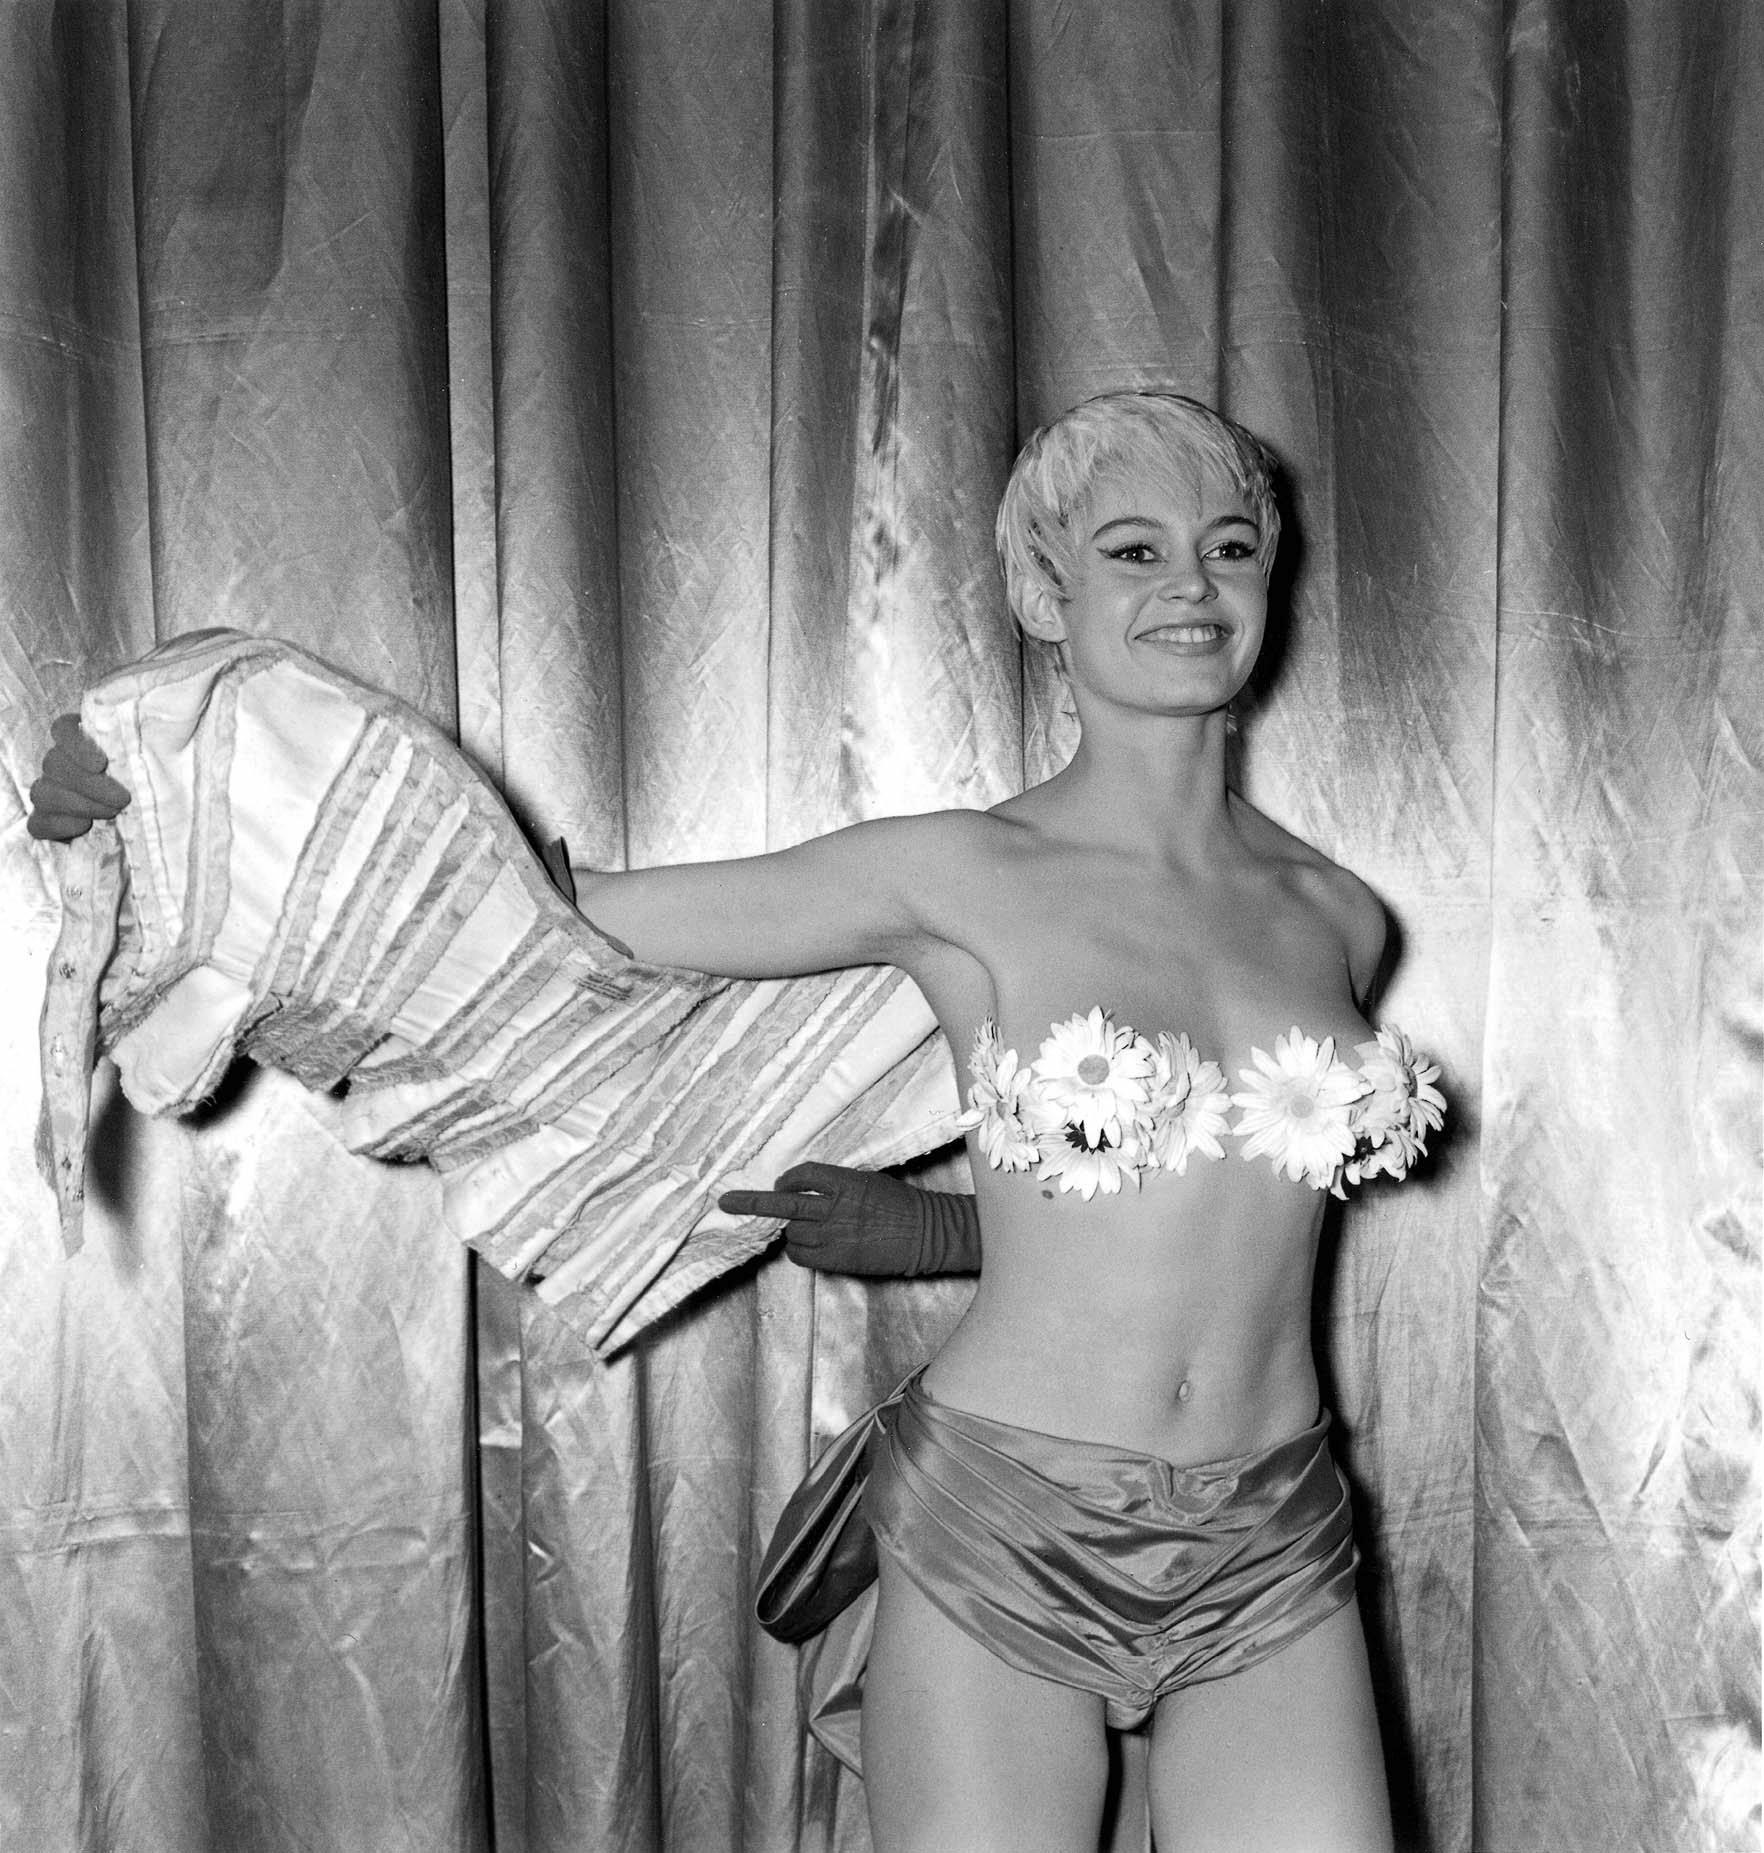 Annex - Bardot, Brigitte (Mademoiselle Striptease)_03.jpg